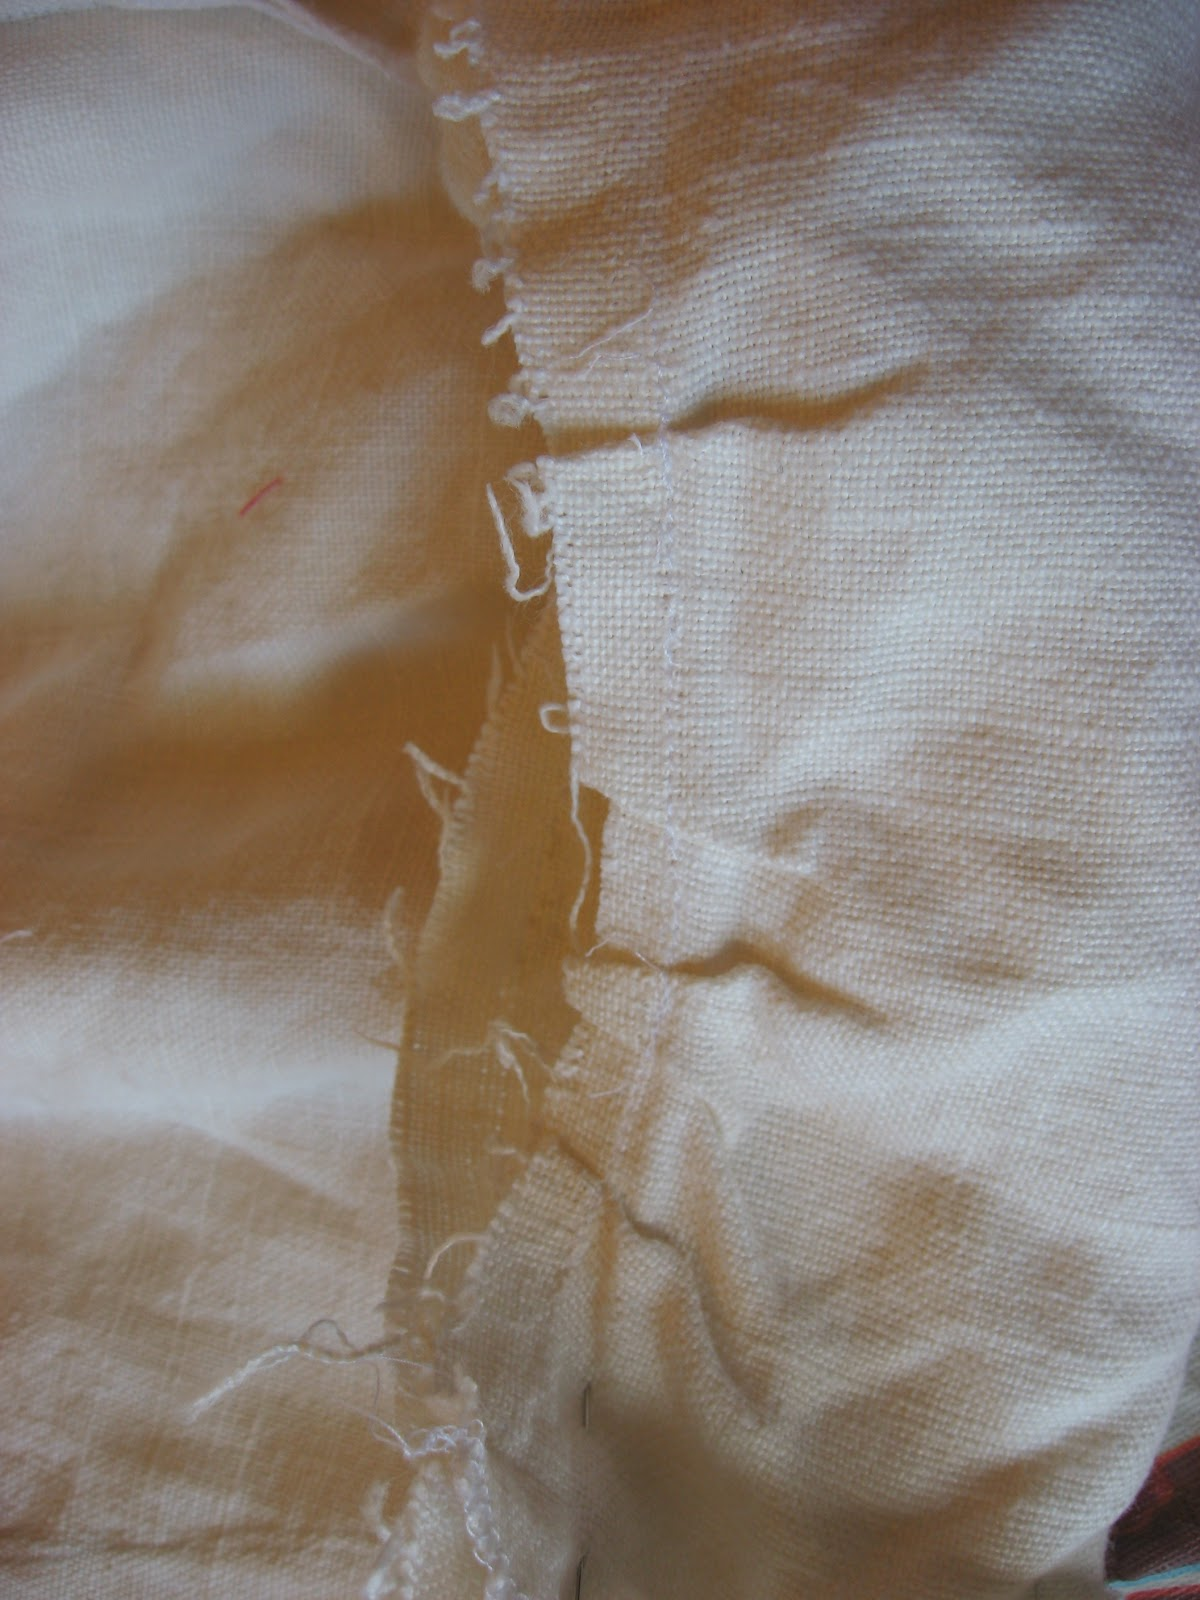 http://4.bp.blogspot.com/_4wH2-8vbkeE/TOCkPKmyEjI/AAAAAAAAAvg/7gy9YnjBOUs/s1600/Breeches+kneeband+before.JPG